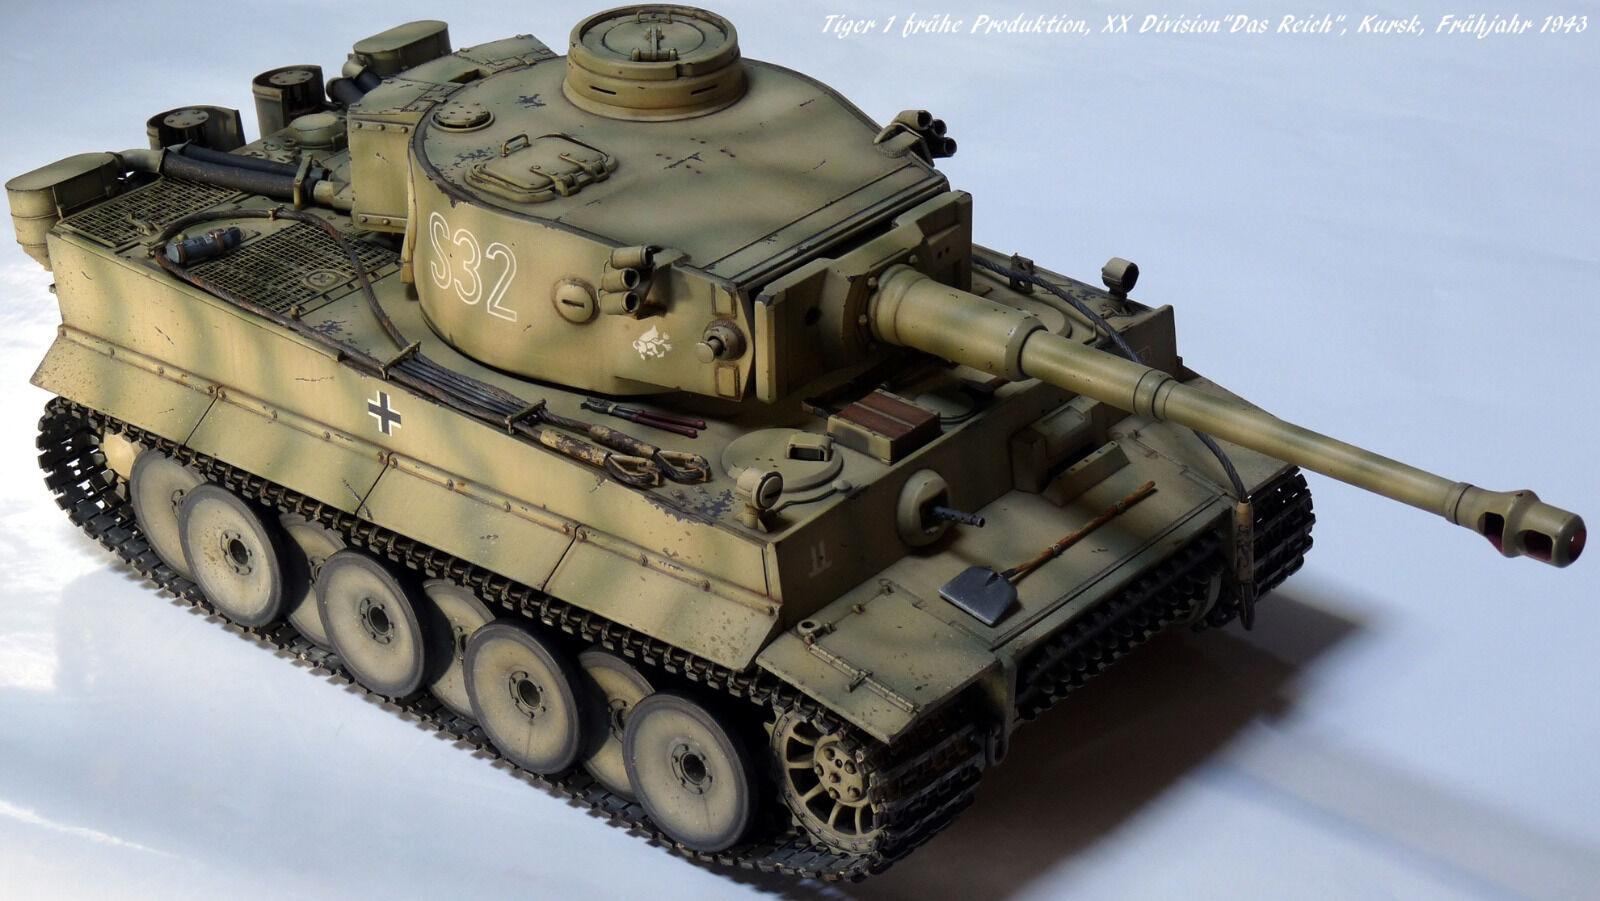 Panzer VI, Tiger 1, Ausf.E, frühe Produktion, 1 16, gebaut  | New Listing